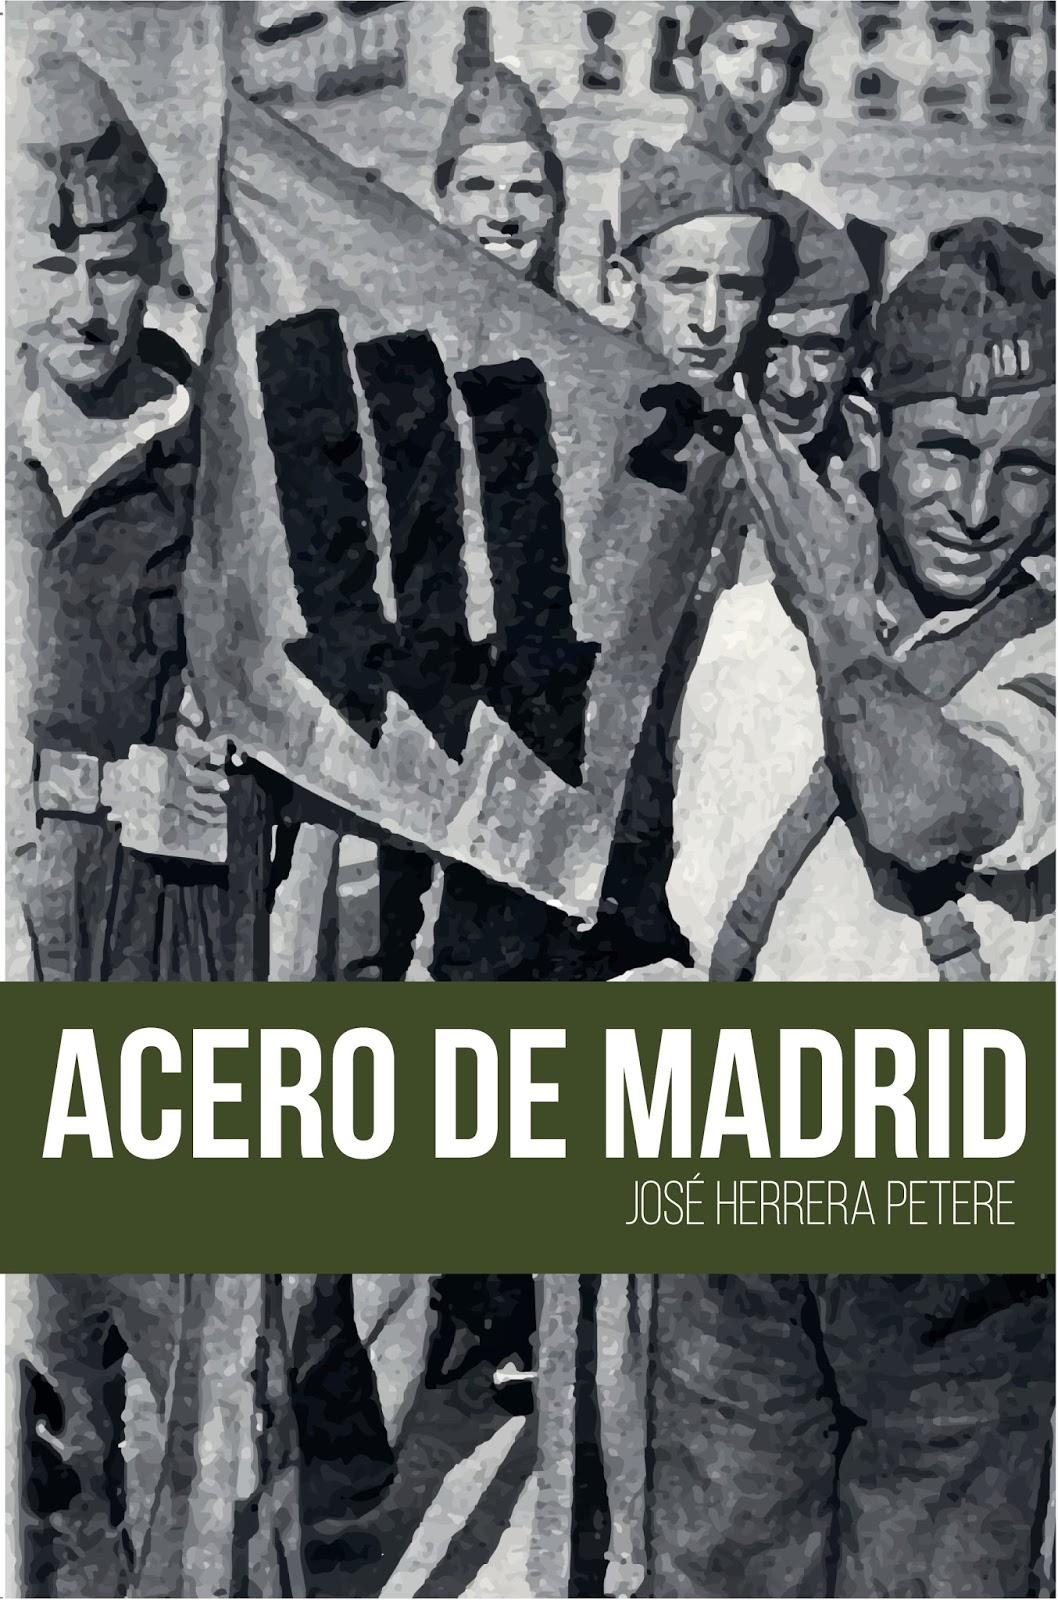 ACERO DE MADRID. José Herrera Petere